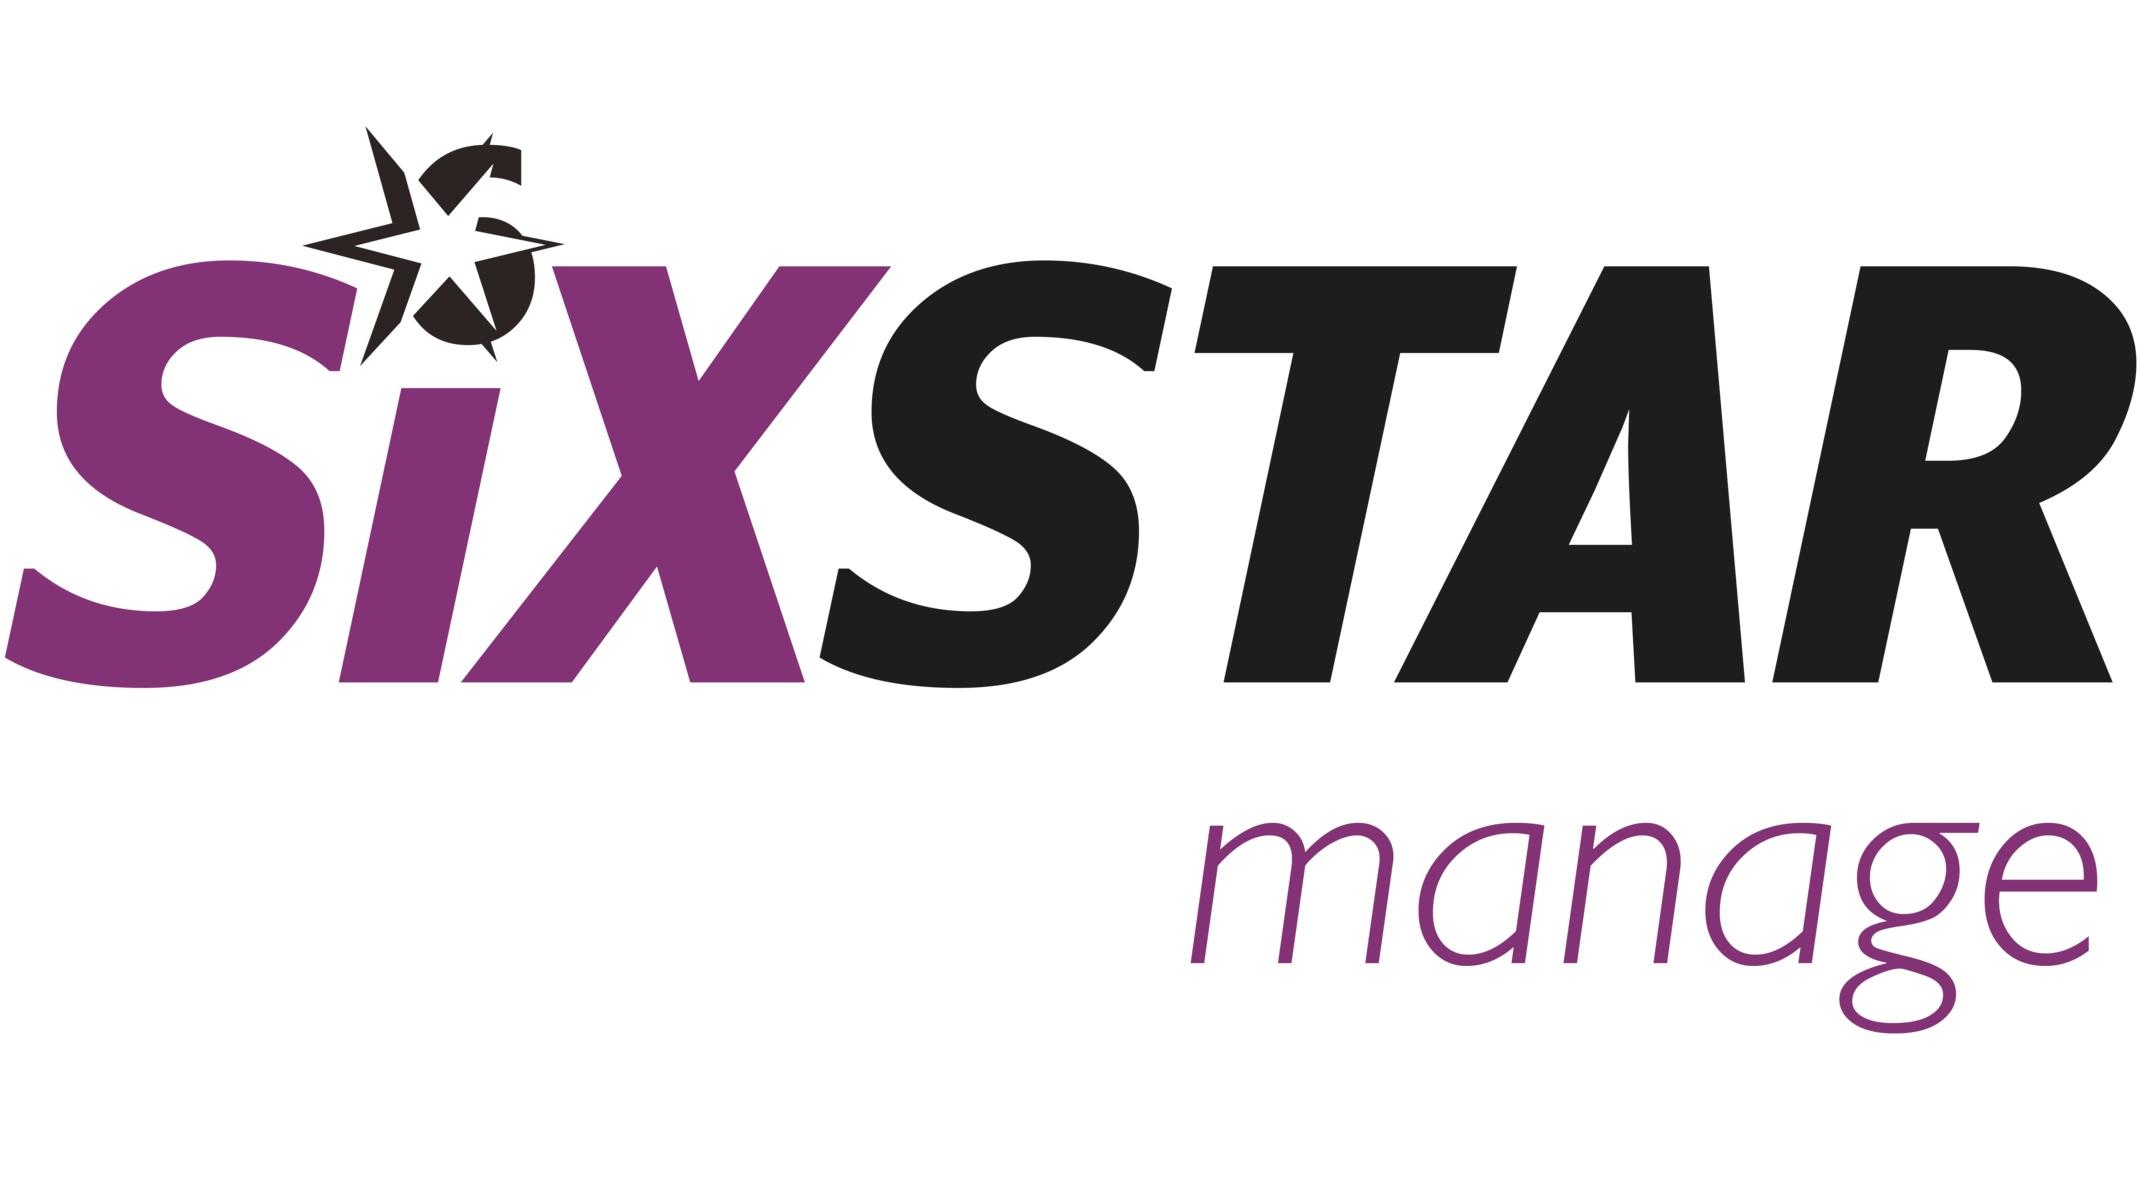 Sixstar+Product+Manage.jpg